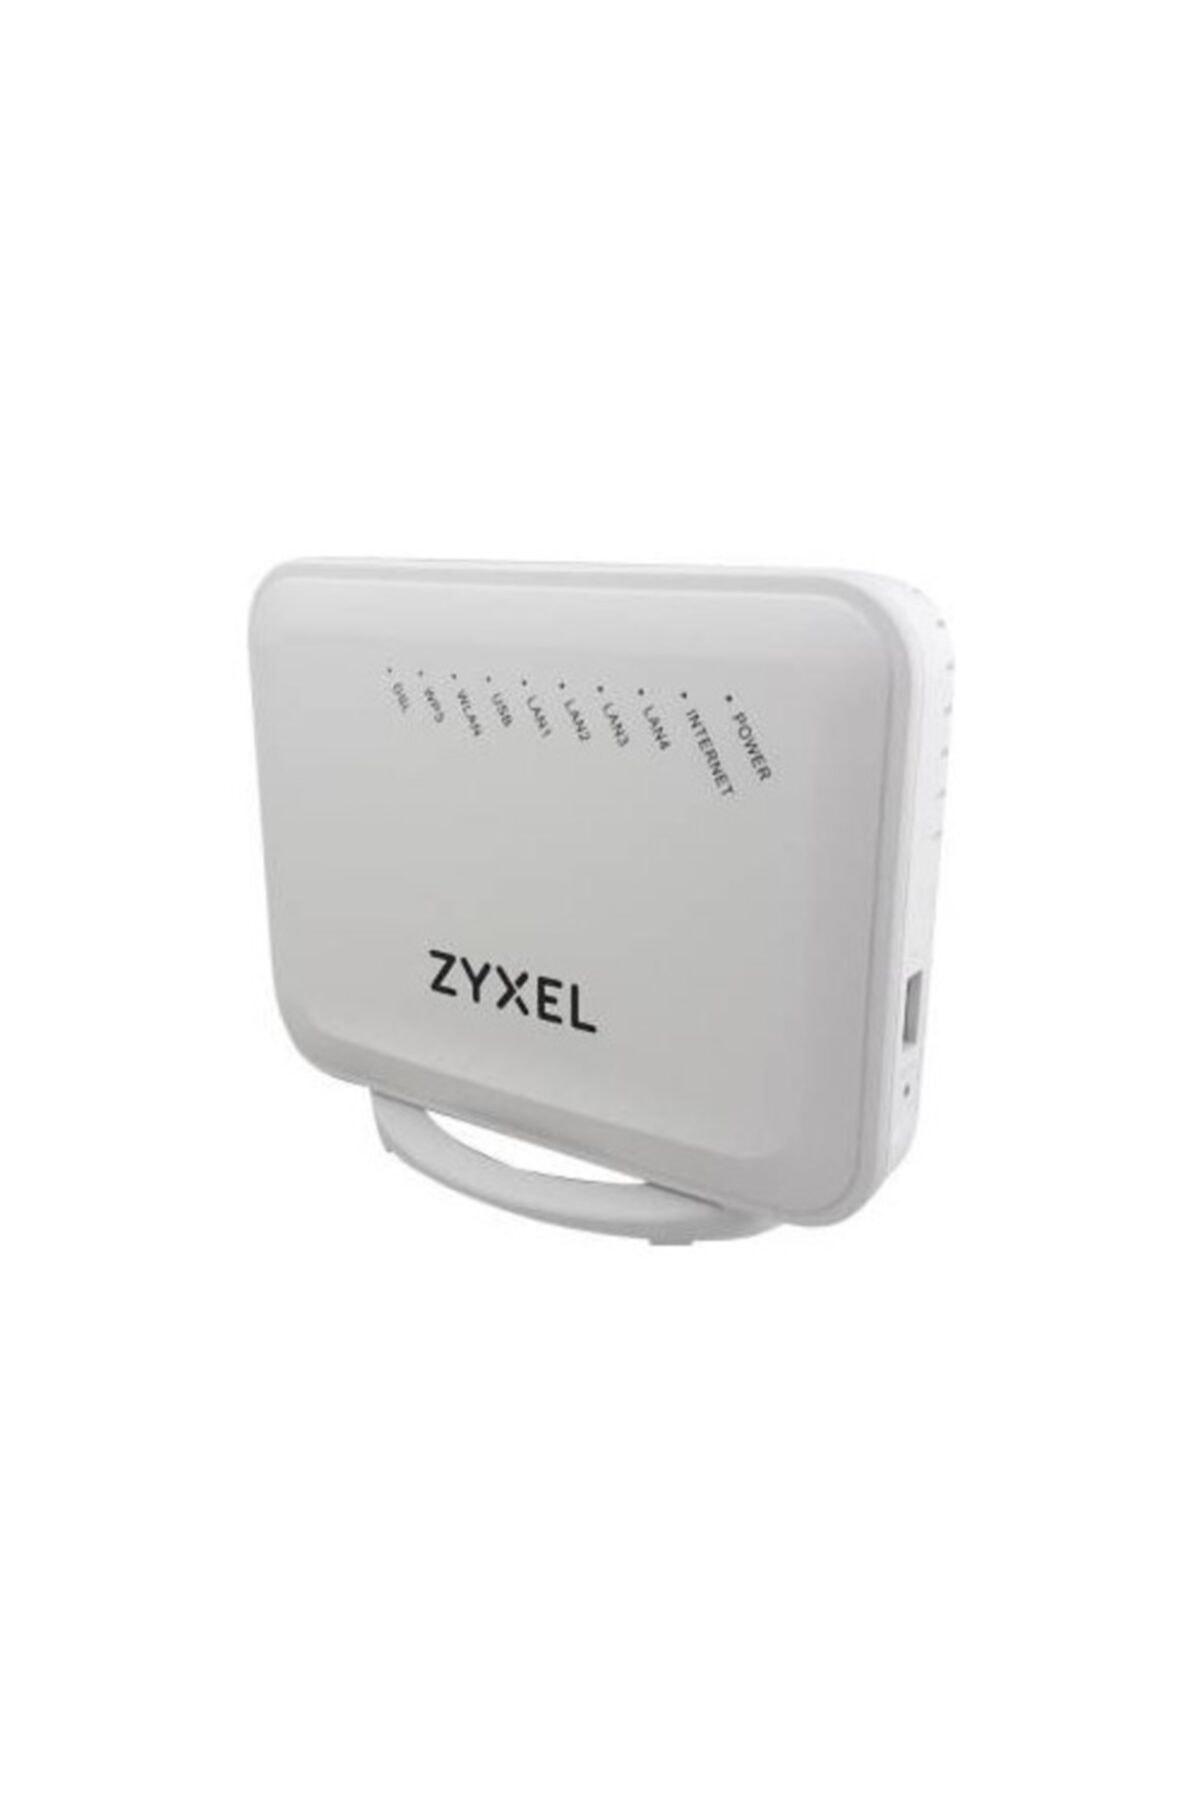 ZyXEL VMG1312-T20B VDSL/ADSL 300Mbps Kablosuz 4-Port Modem 1